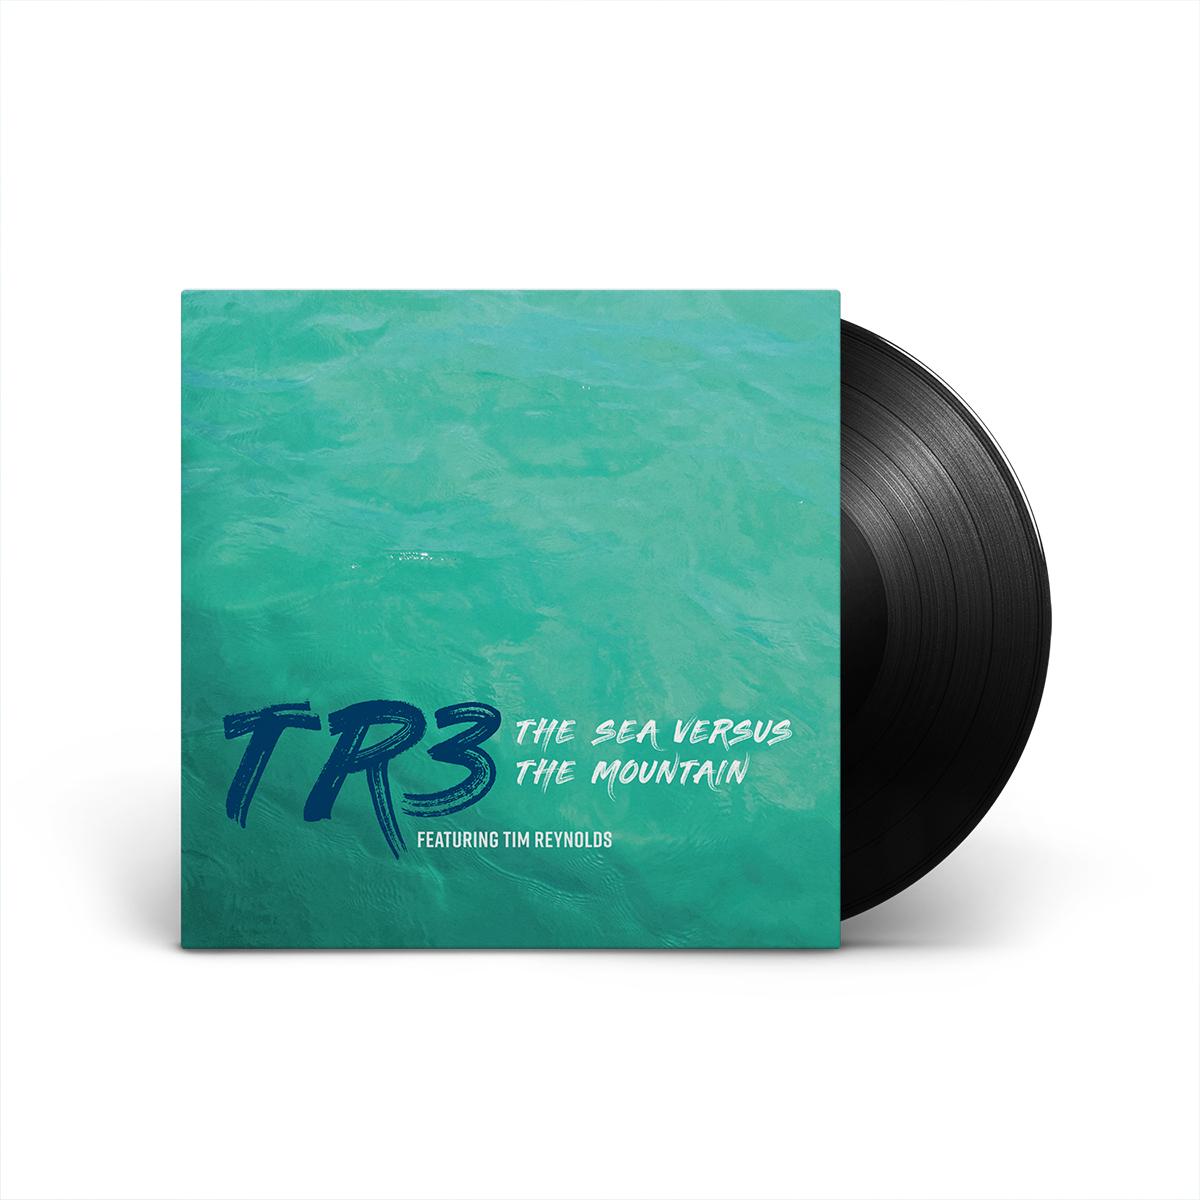 The Sea Versus the Mountain LP